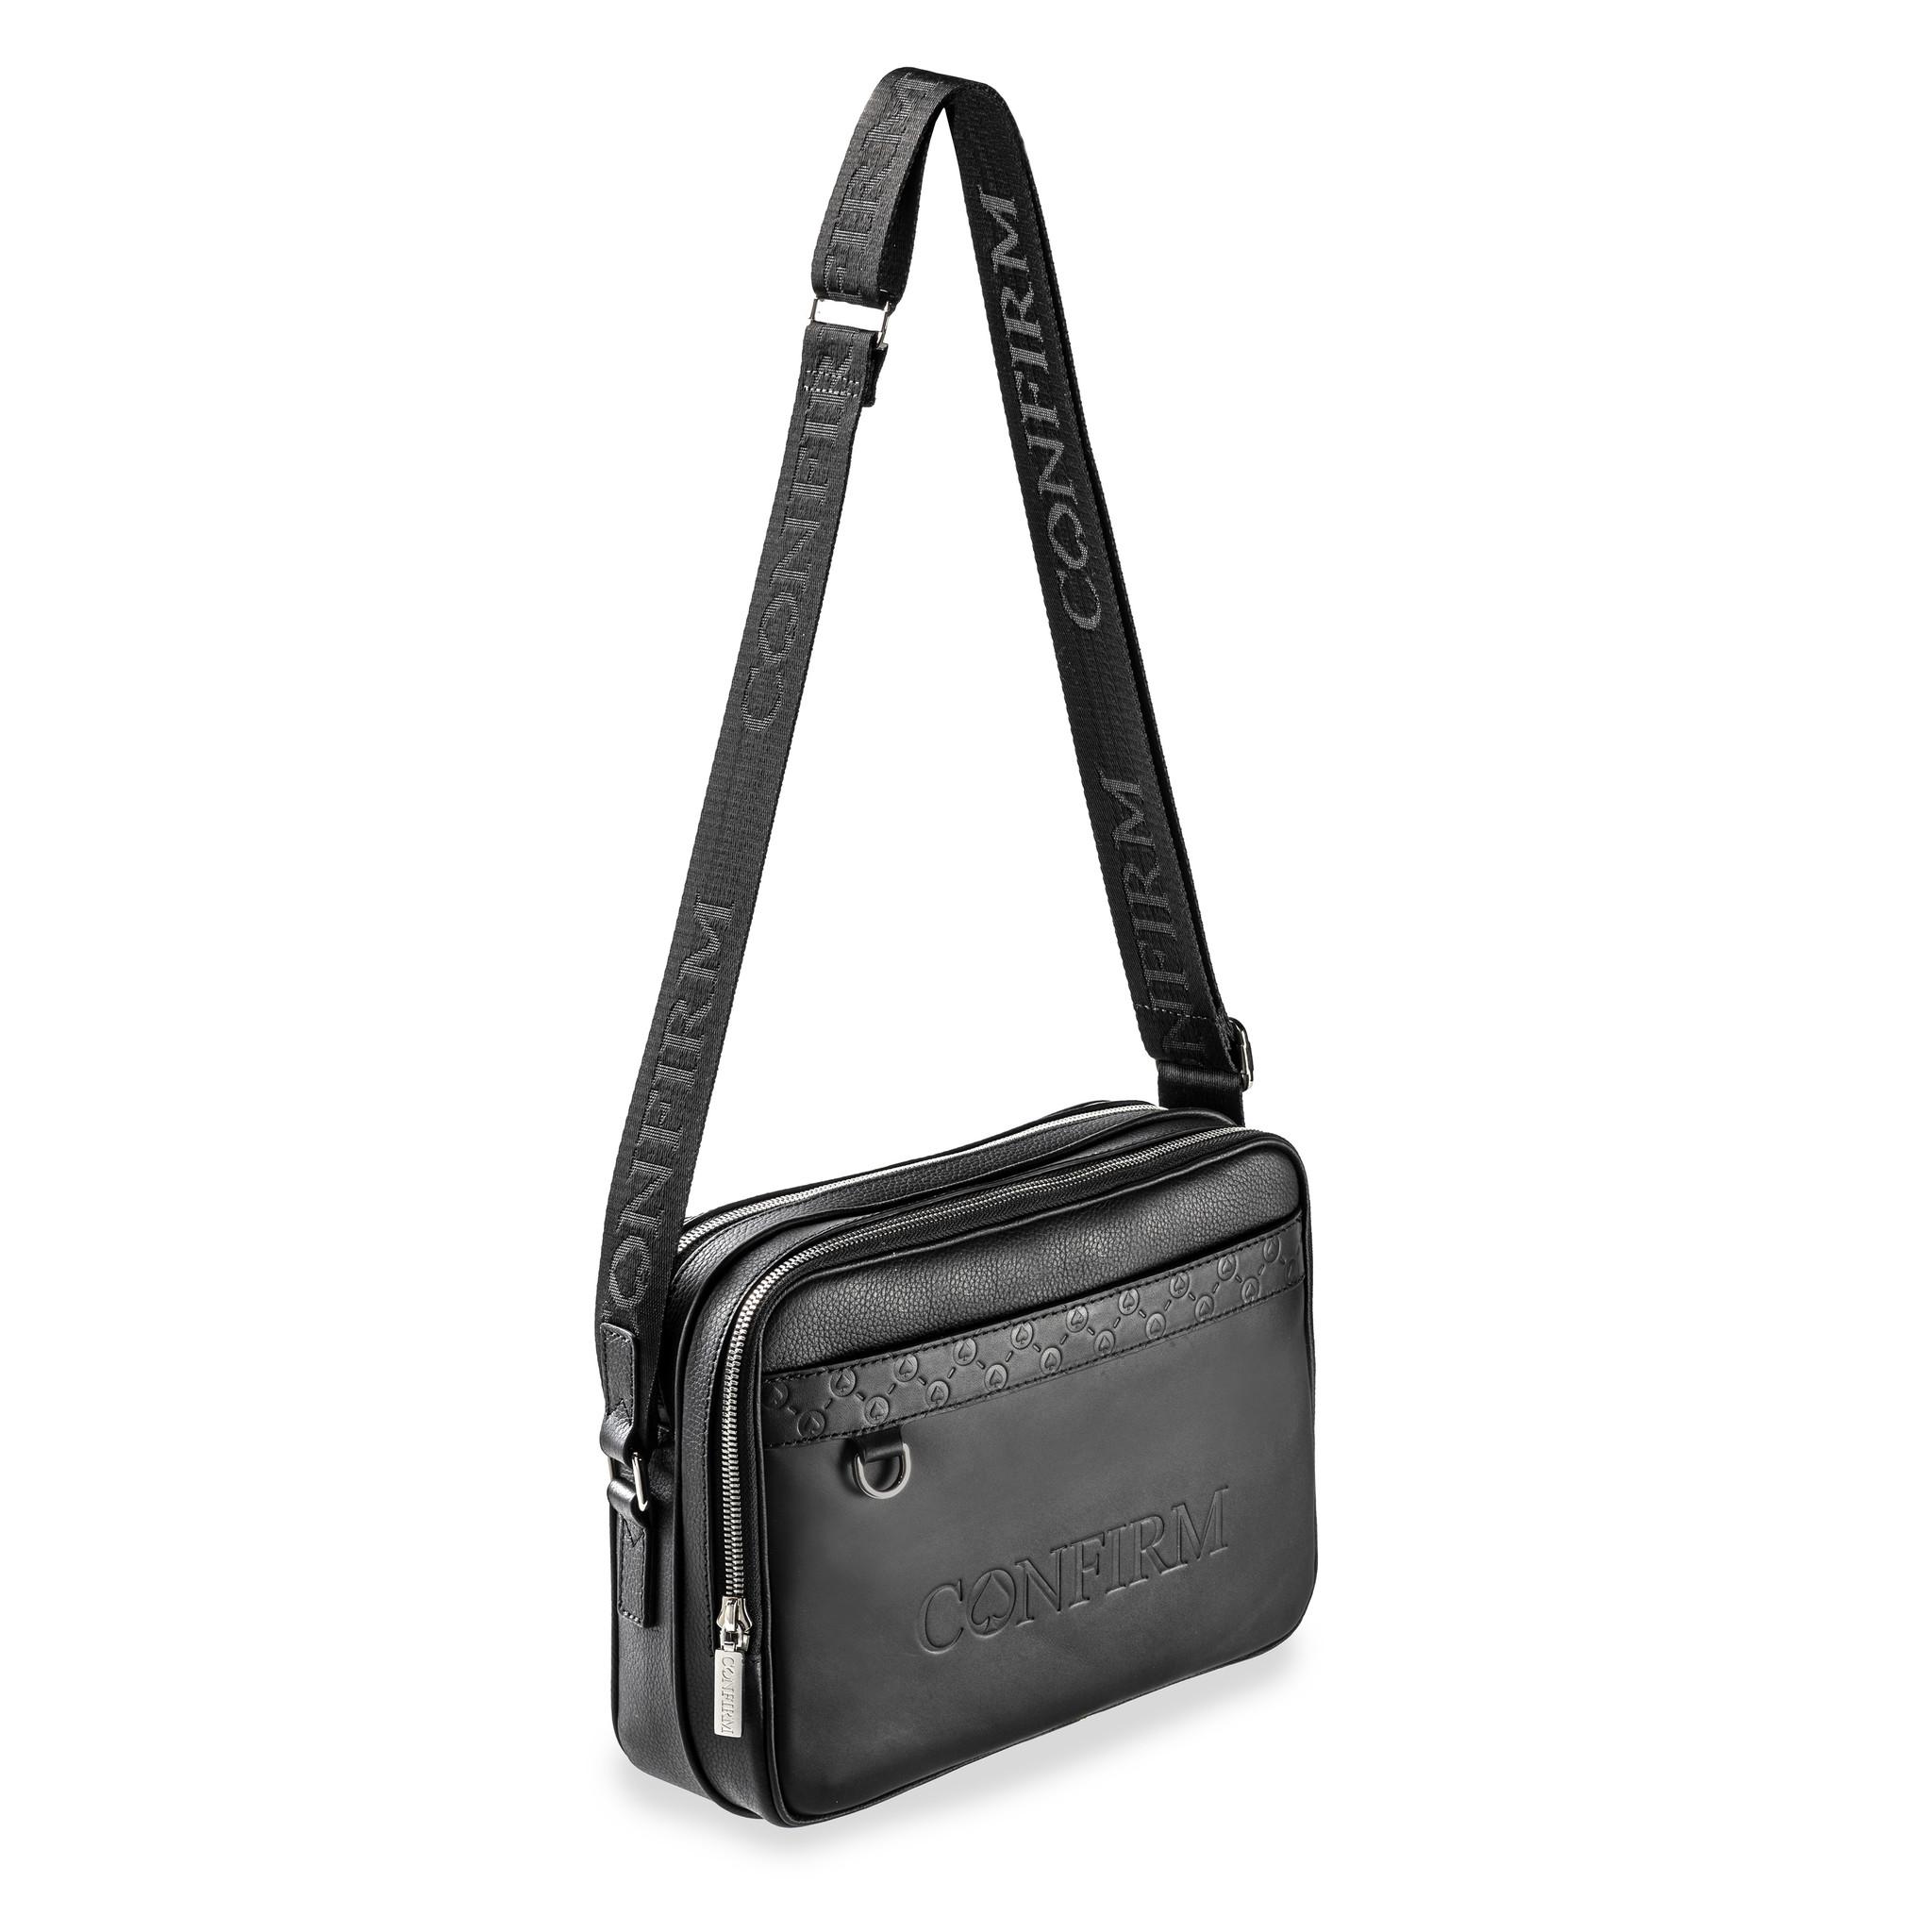 Confirm messenger bag Humero - smooth-3